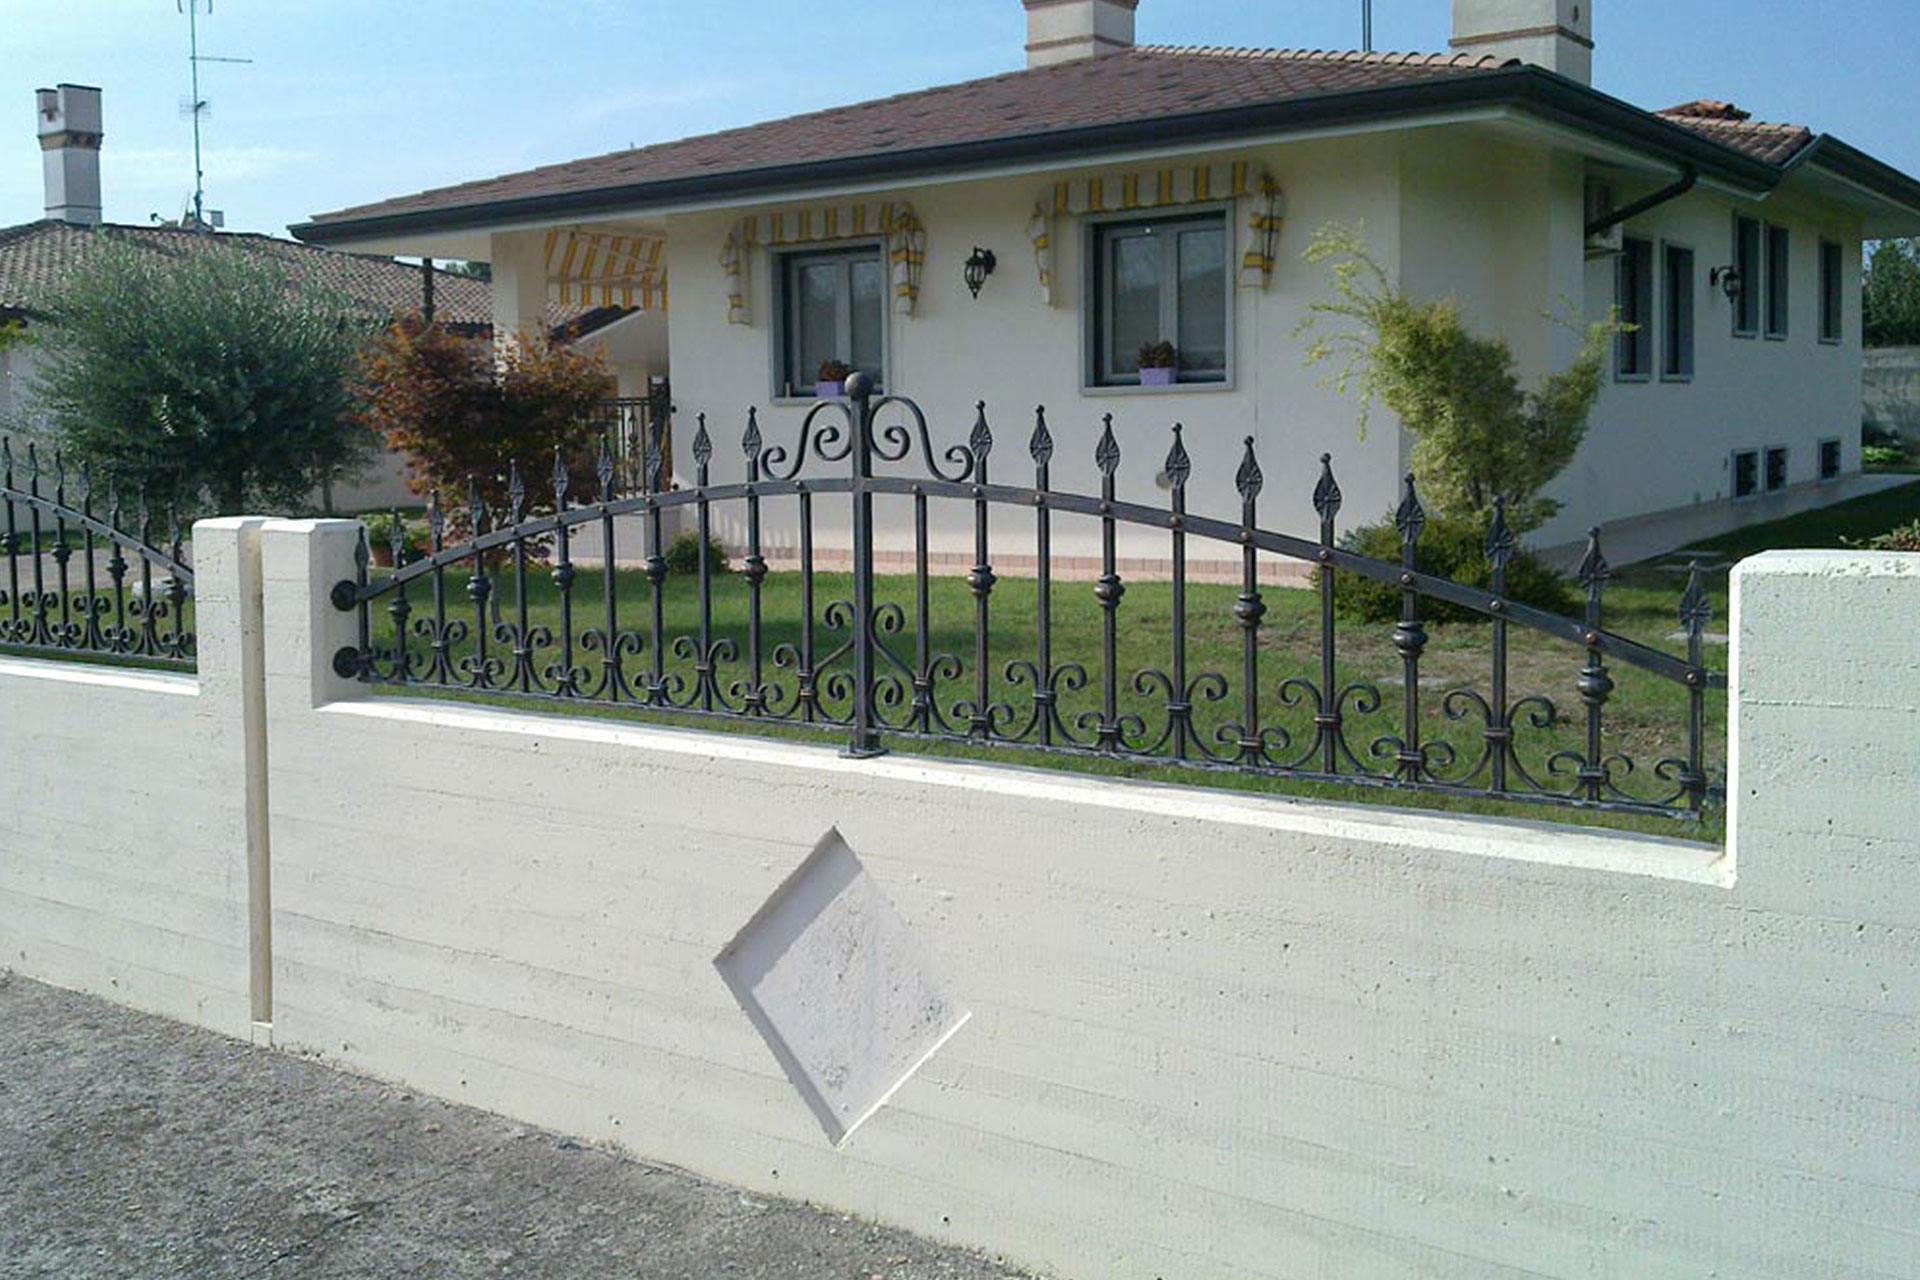 cancelli recinzioni carpenteria metallica albo serramenti trieste